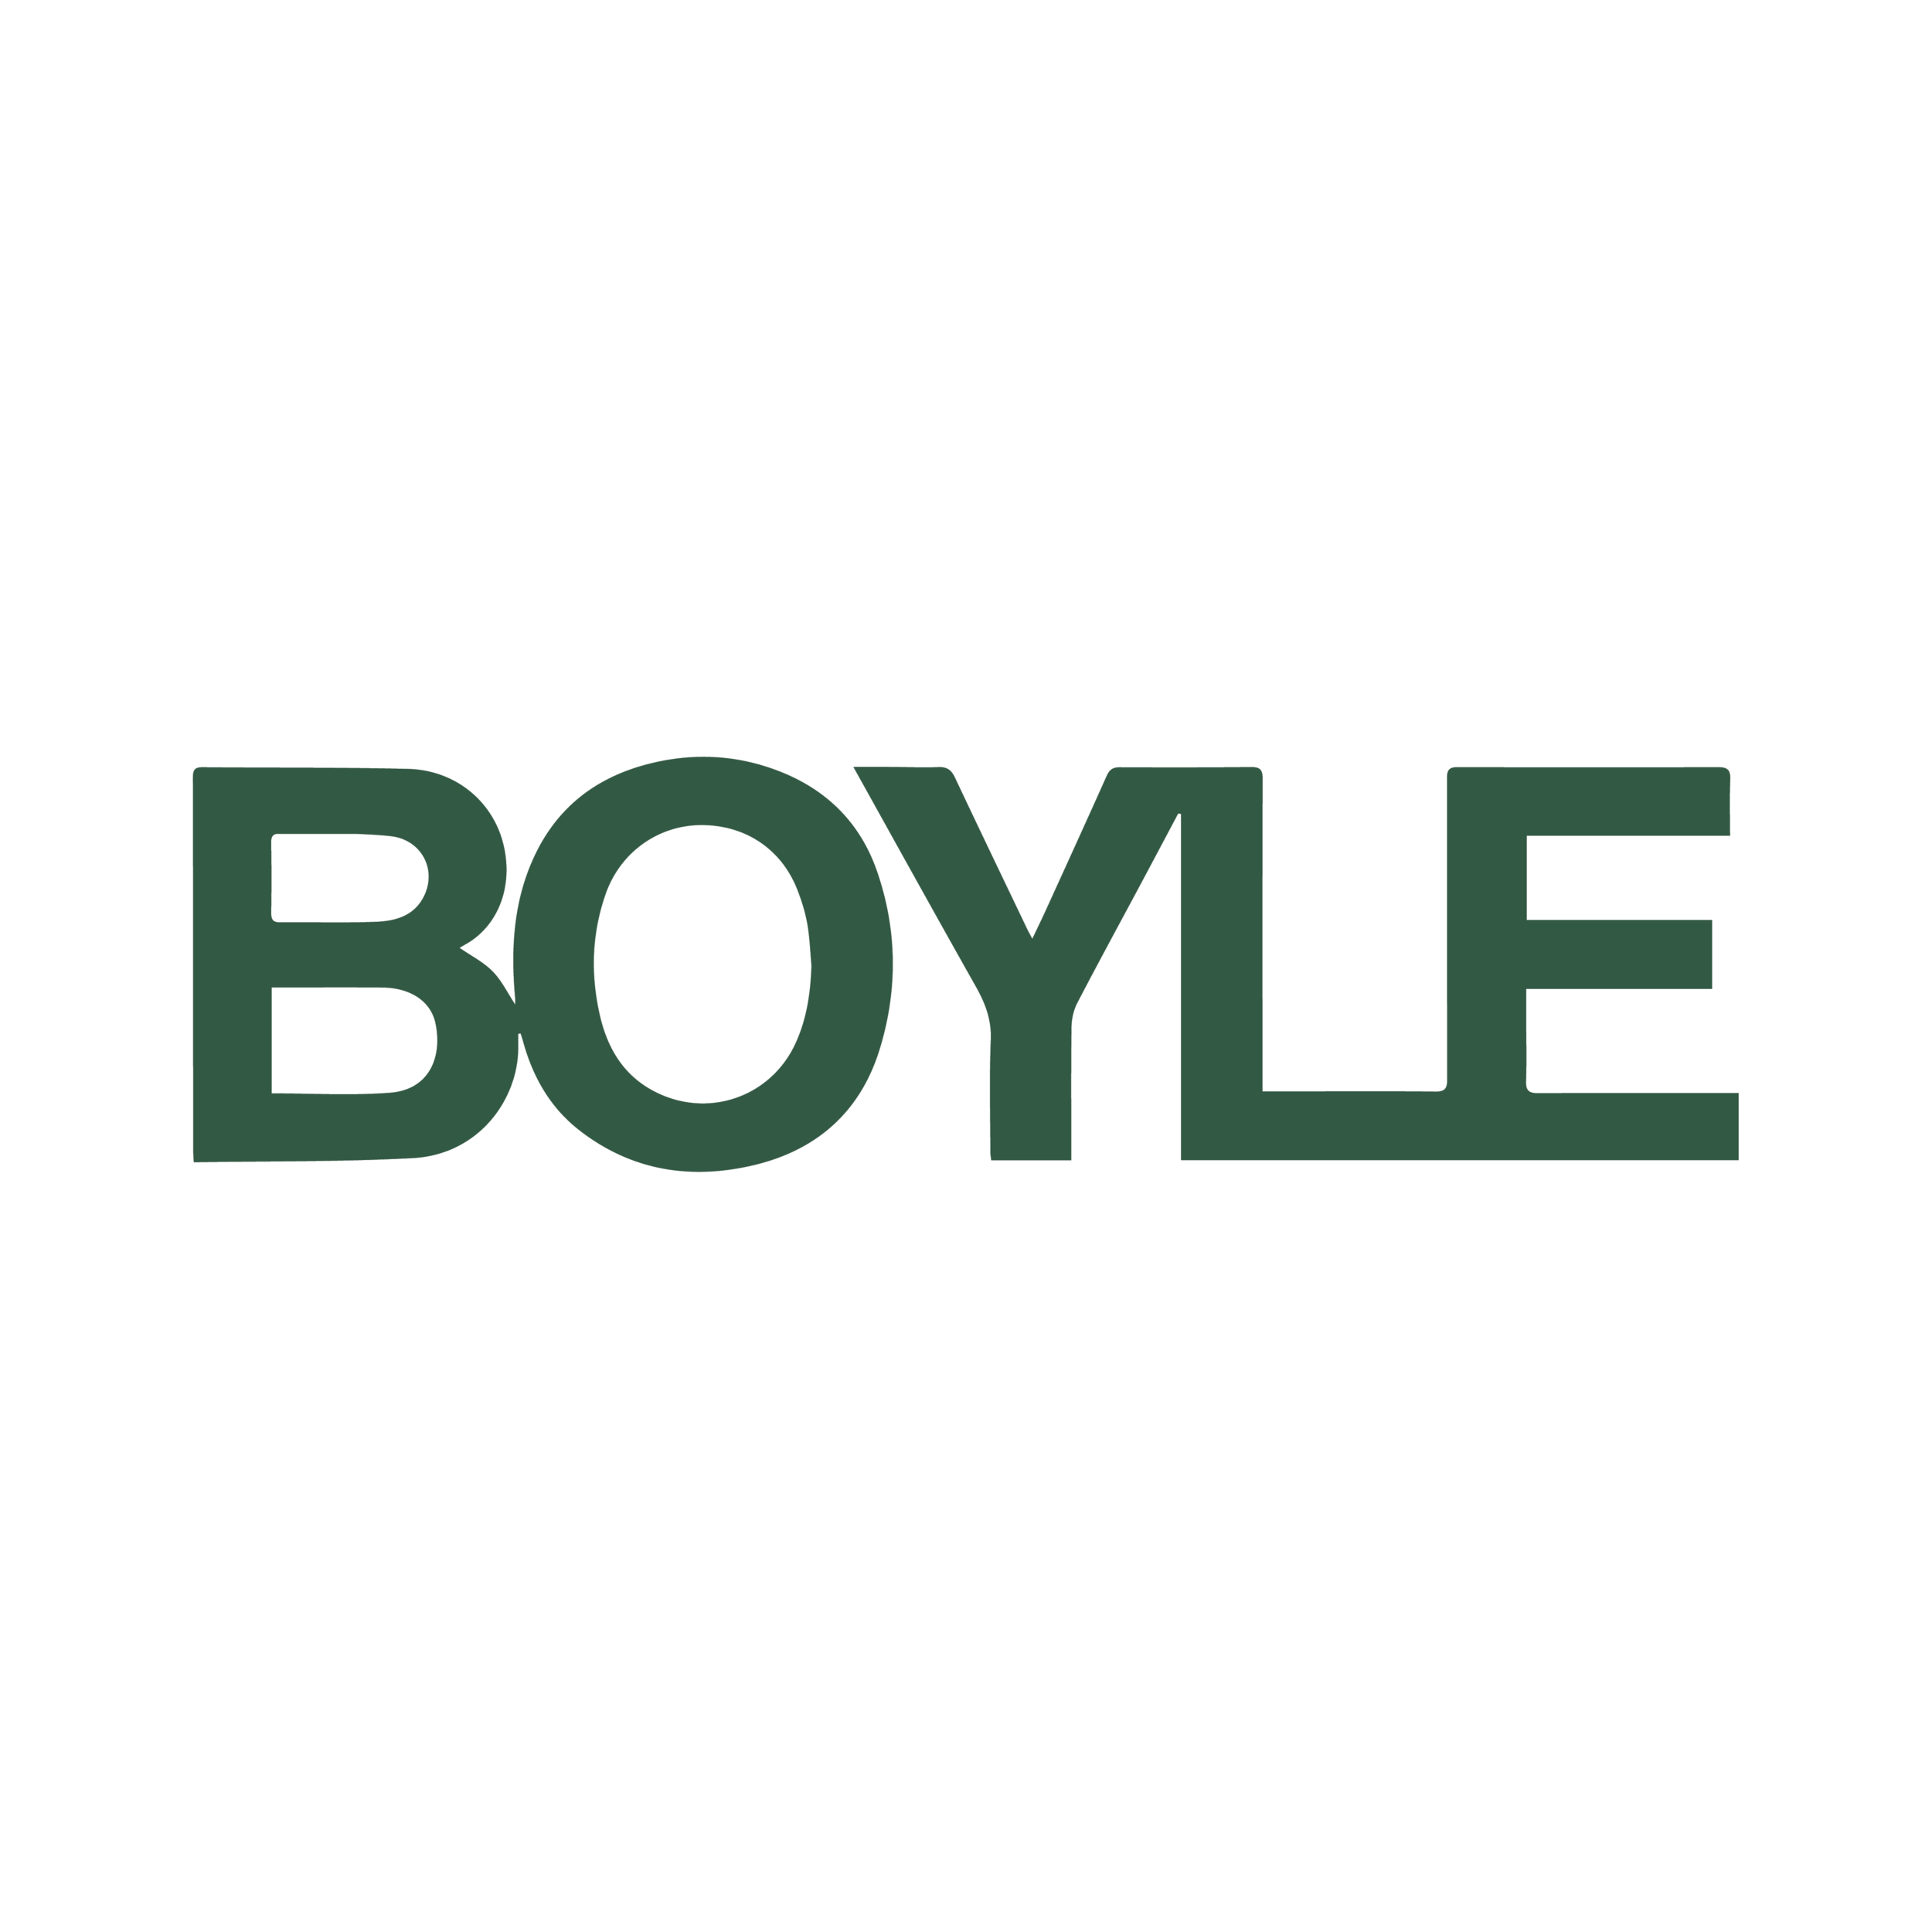 Boyle Logo.png